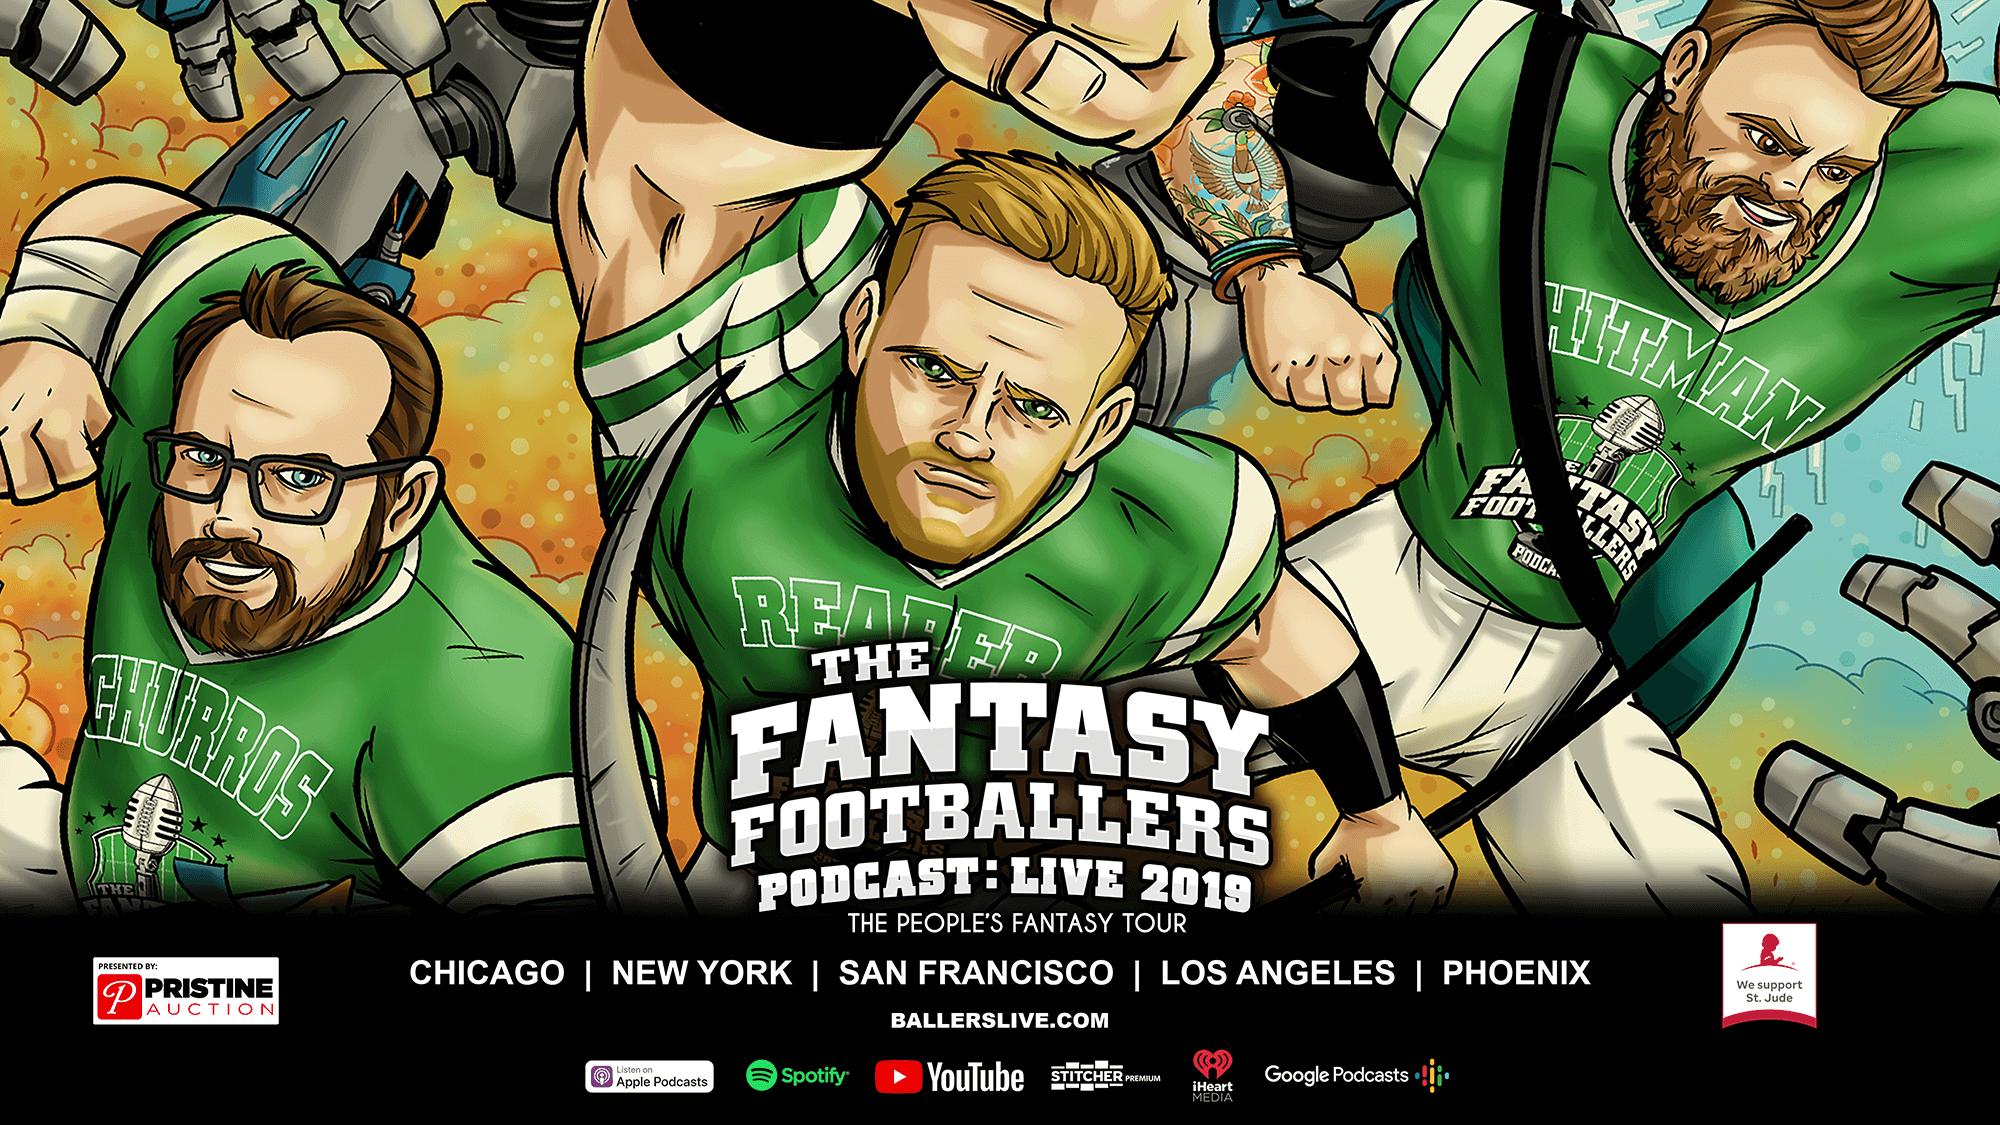 Fantasy Footballers LIVE Tour - Fantasy Footballers Podcast